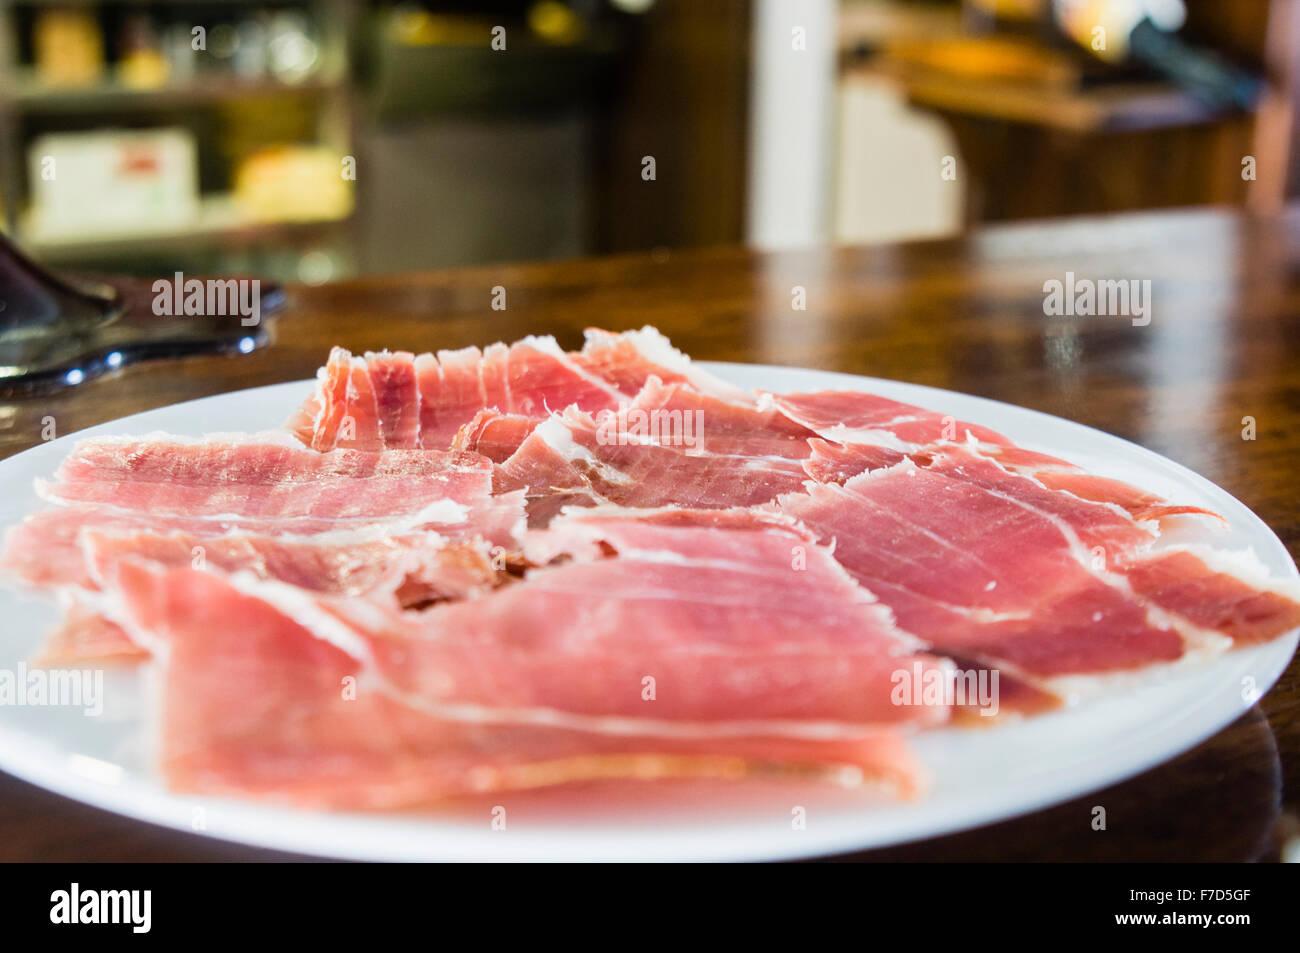 Spanish ham (Jamón ibérico, Iberian ham, pata negra) cured ham served as a tapas in a bar - Stock Image